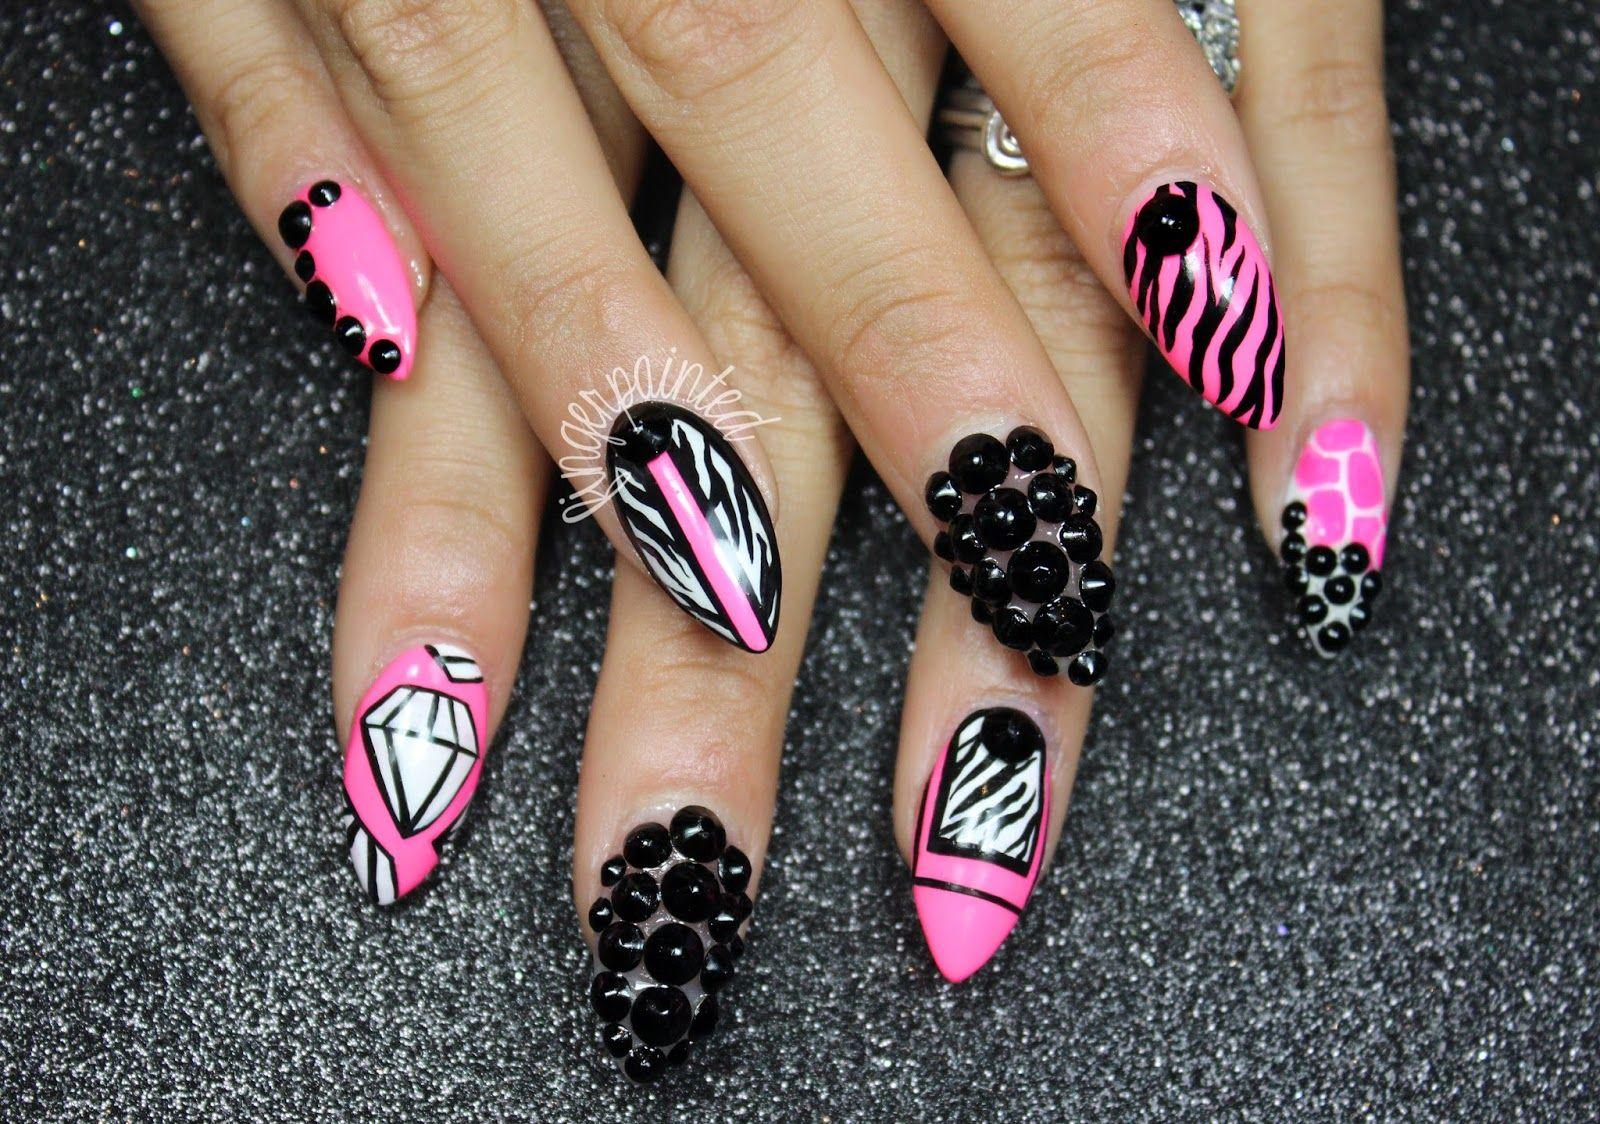 stiletto nail design 2014 general-fashionable-stiletto